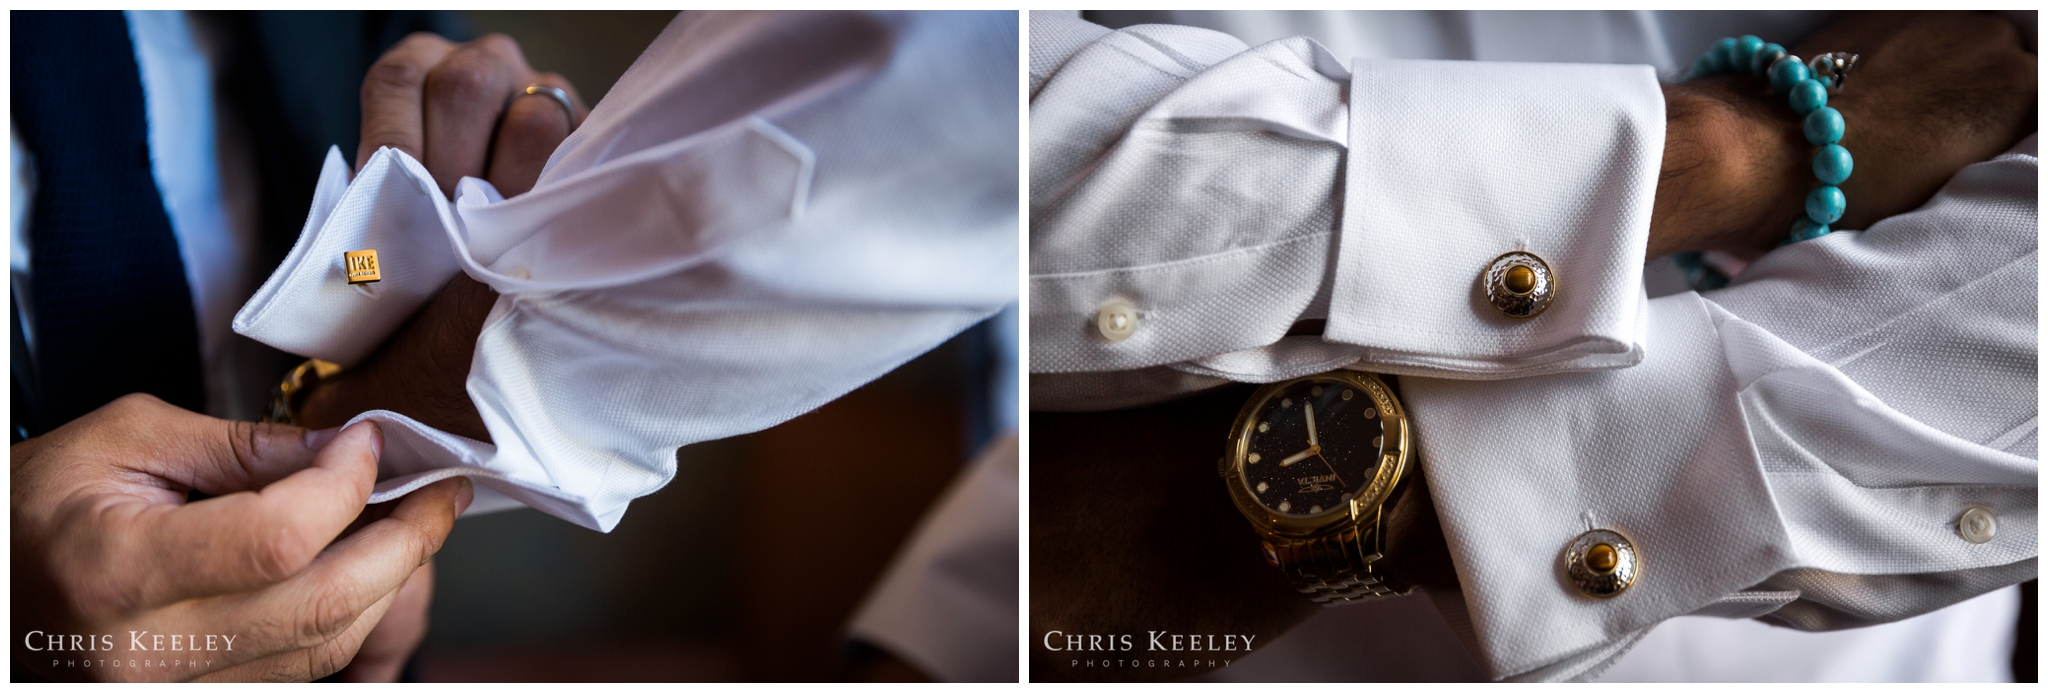 grace-restaurant-portland-maine-wedding-photographer-chris-keeley-09.jpg